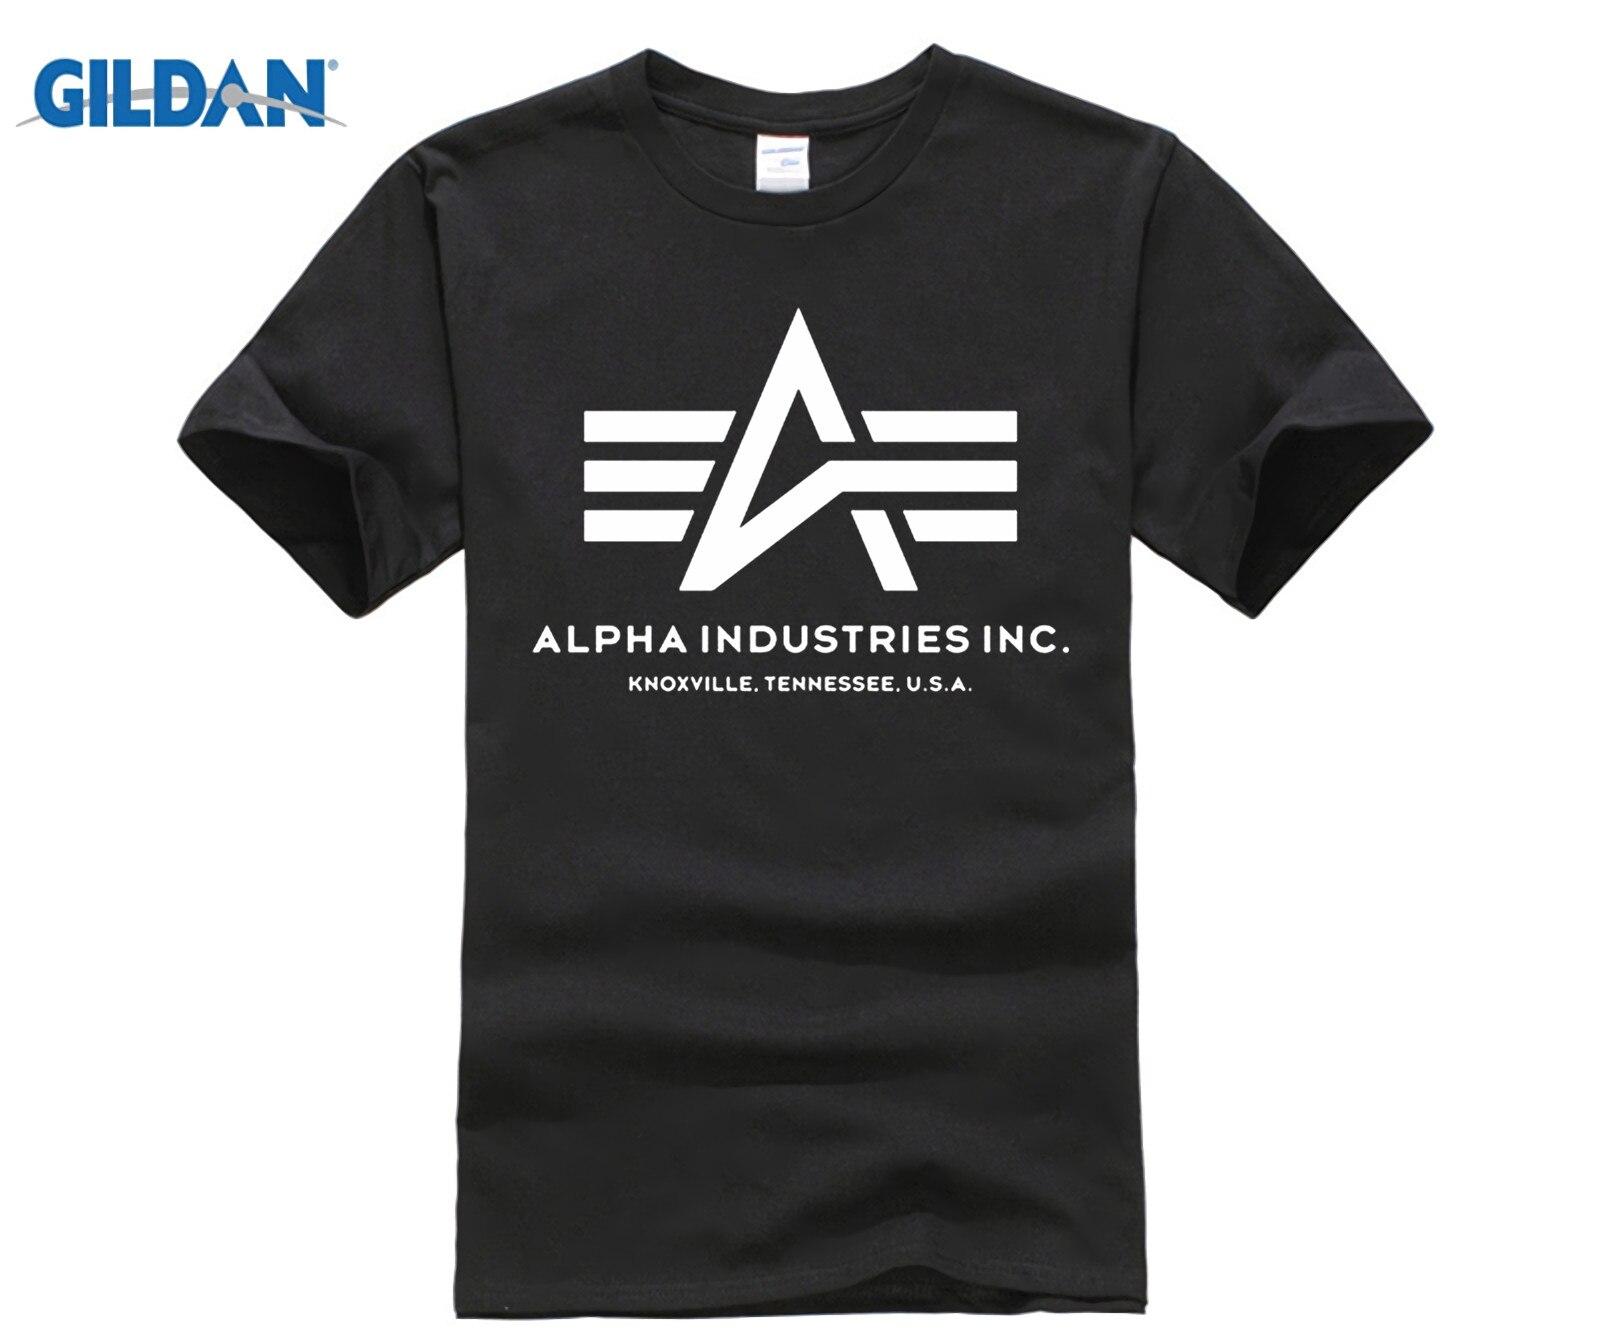 pattern   t     shirt   Summer Fashion   T  -  shirts   Alpha Industries   T  -  shirt   Short Sleeves Tops Tee   Shirt   Harajuku Camiseta   T     shirt